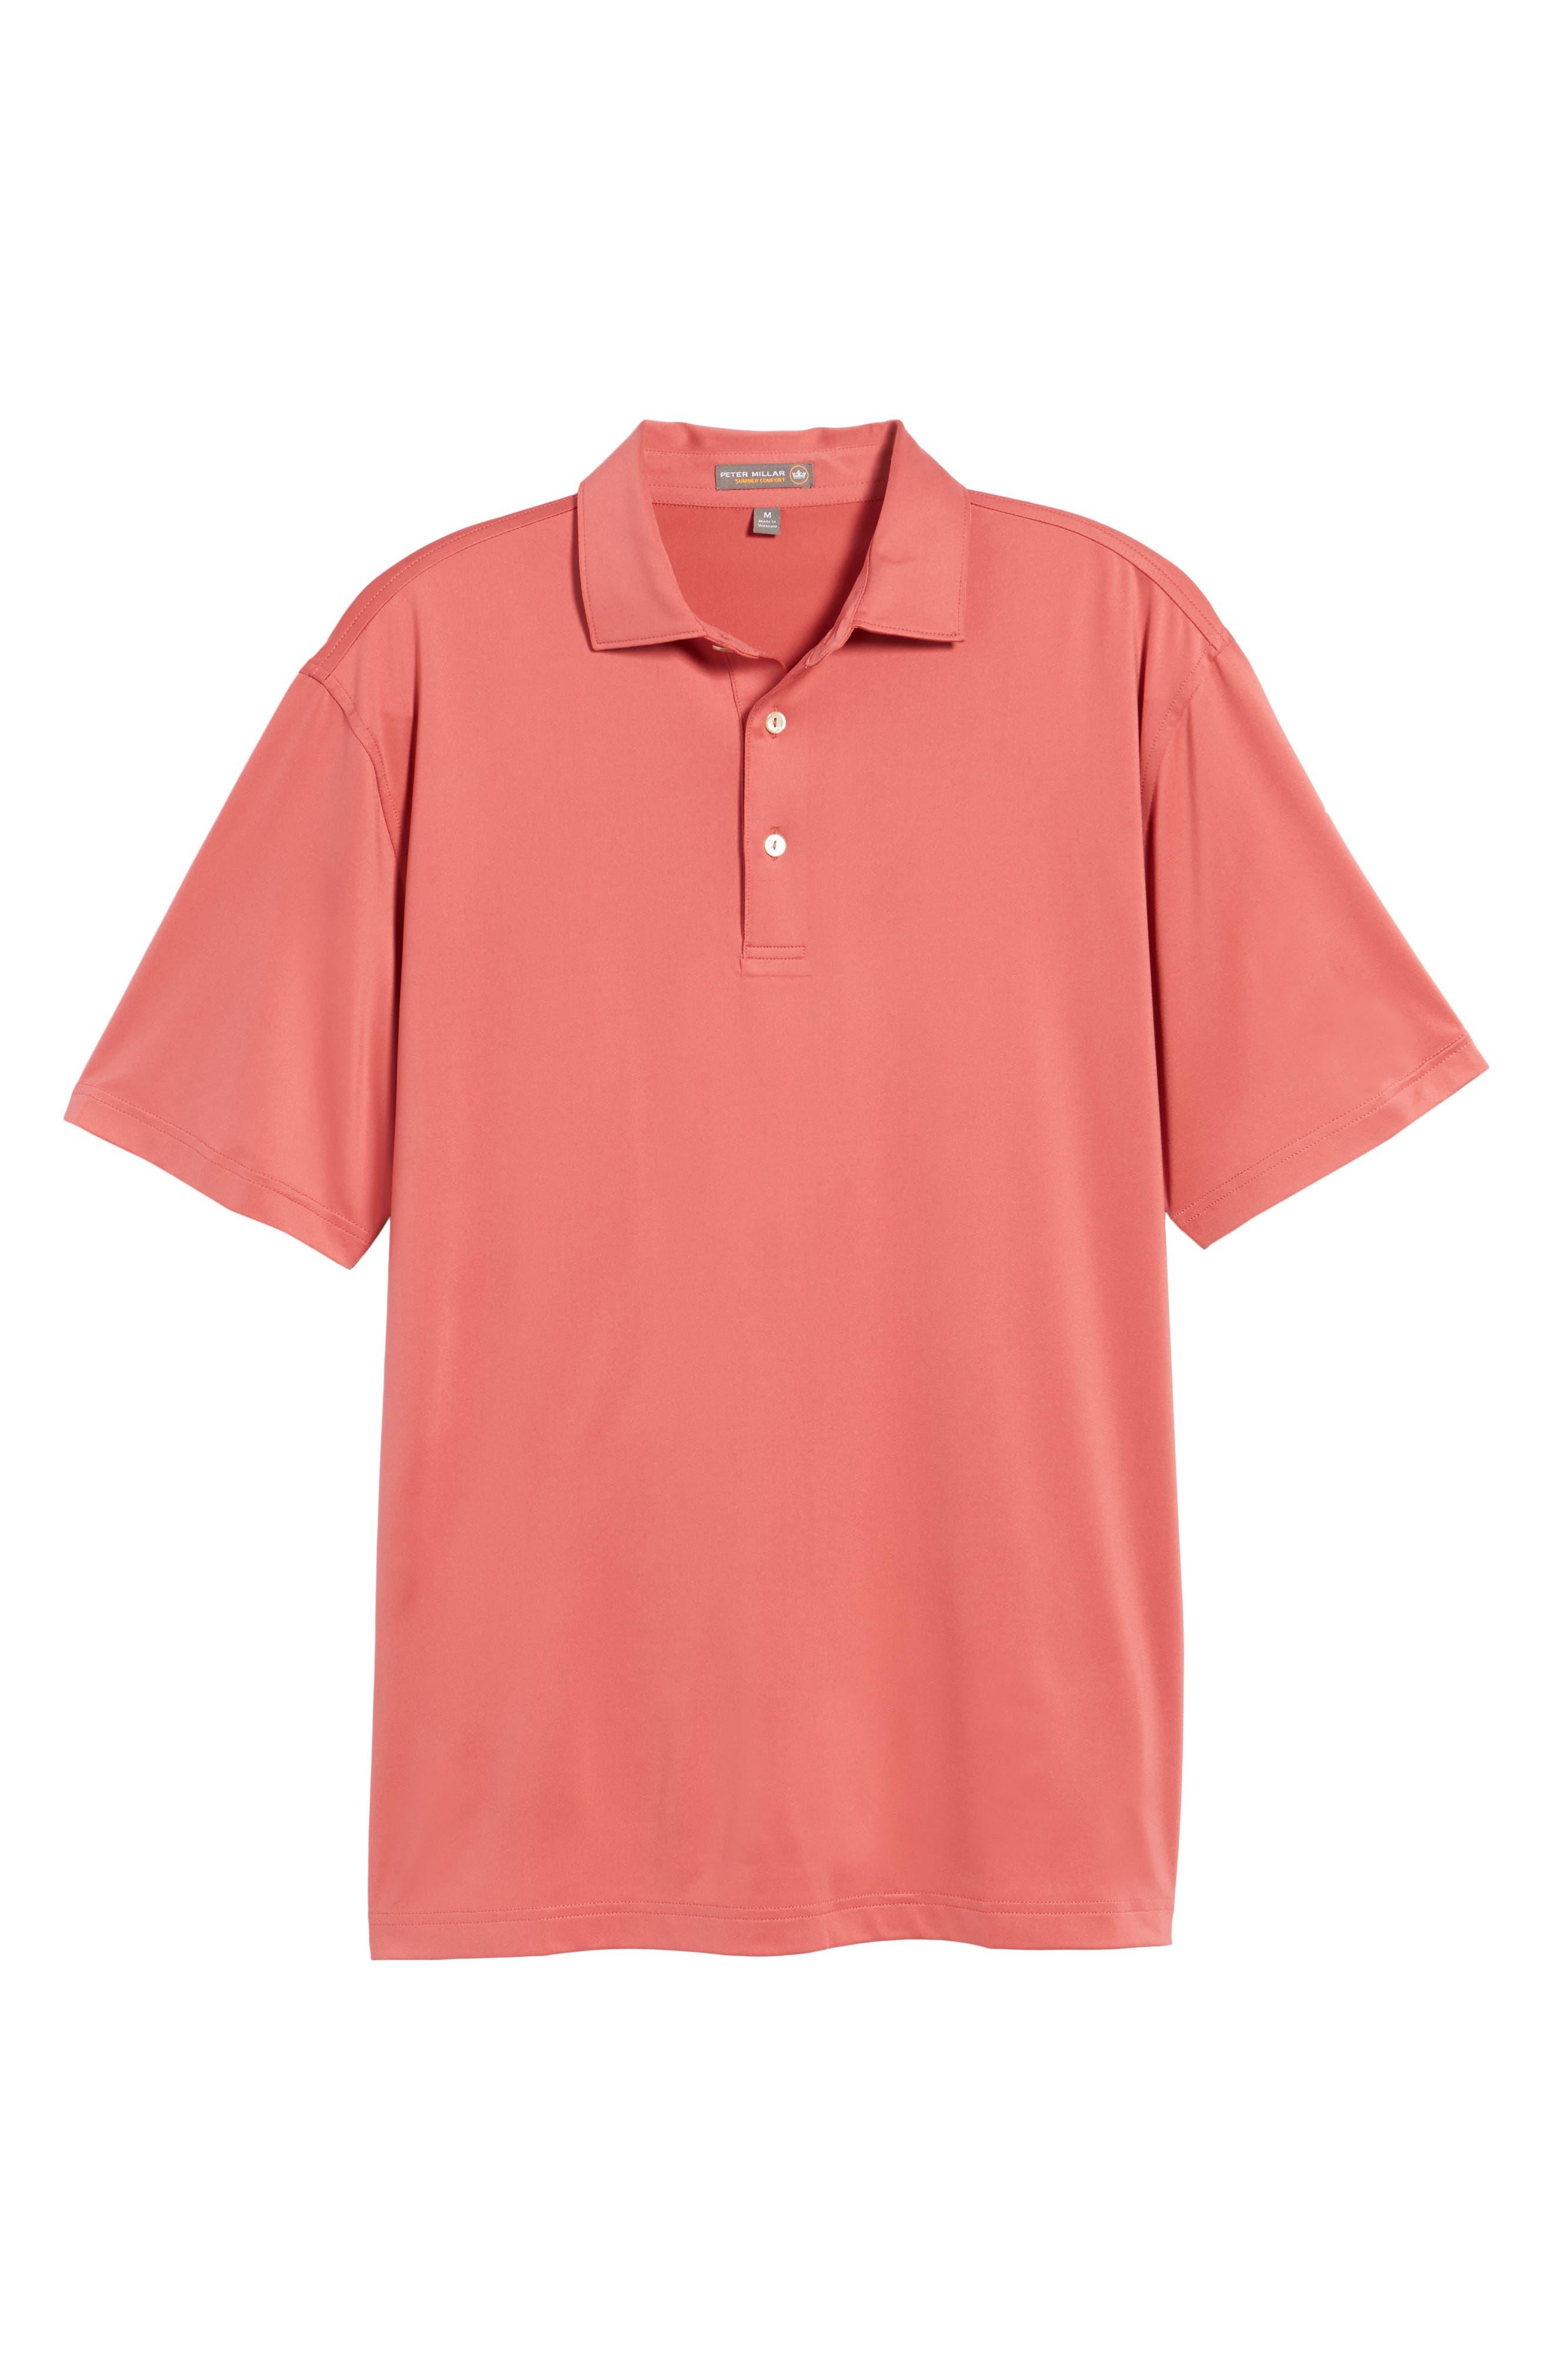 Sean Stretch Jersey Polo,                             Alternate thumbnail 6, color,                             600